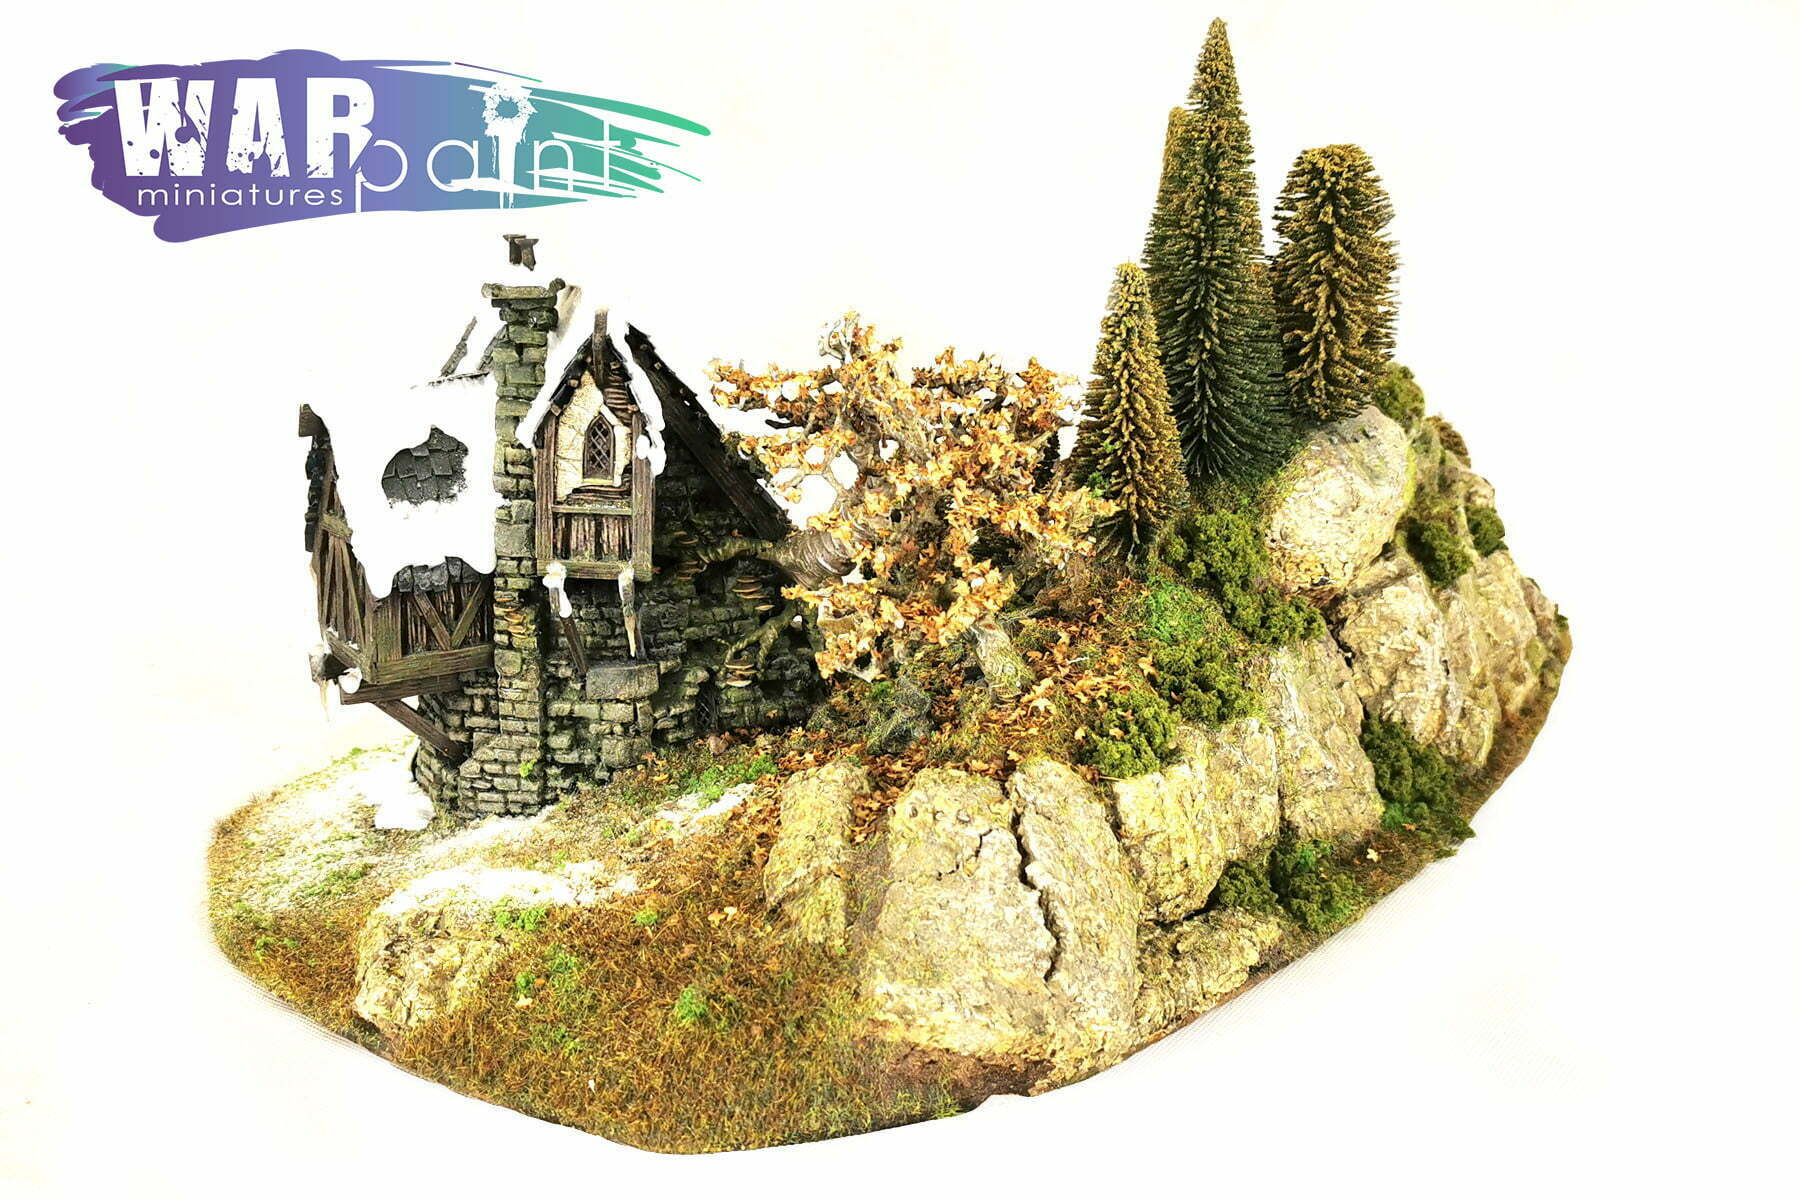 Hunting-Lodge-Scenery-web-optimised-1